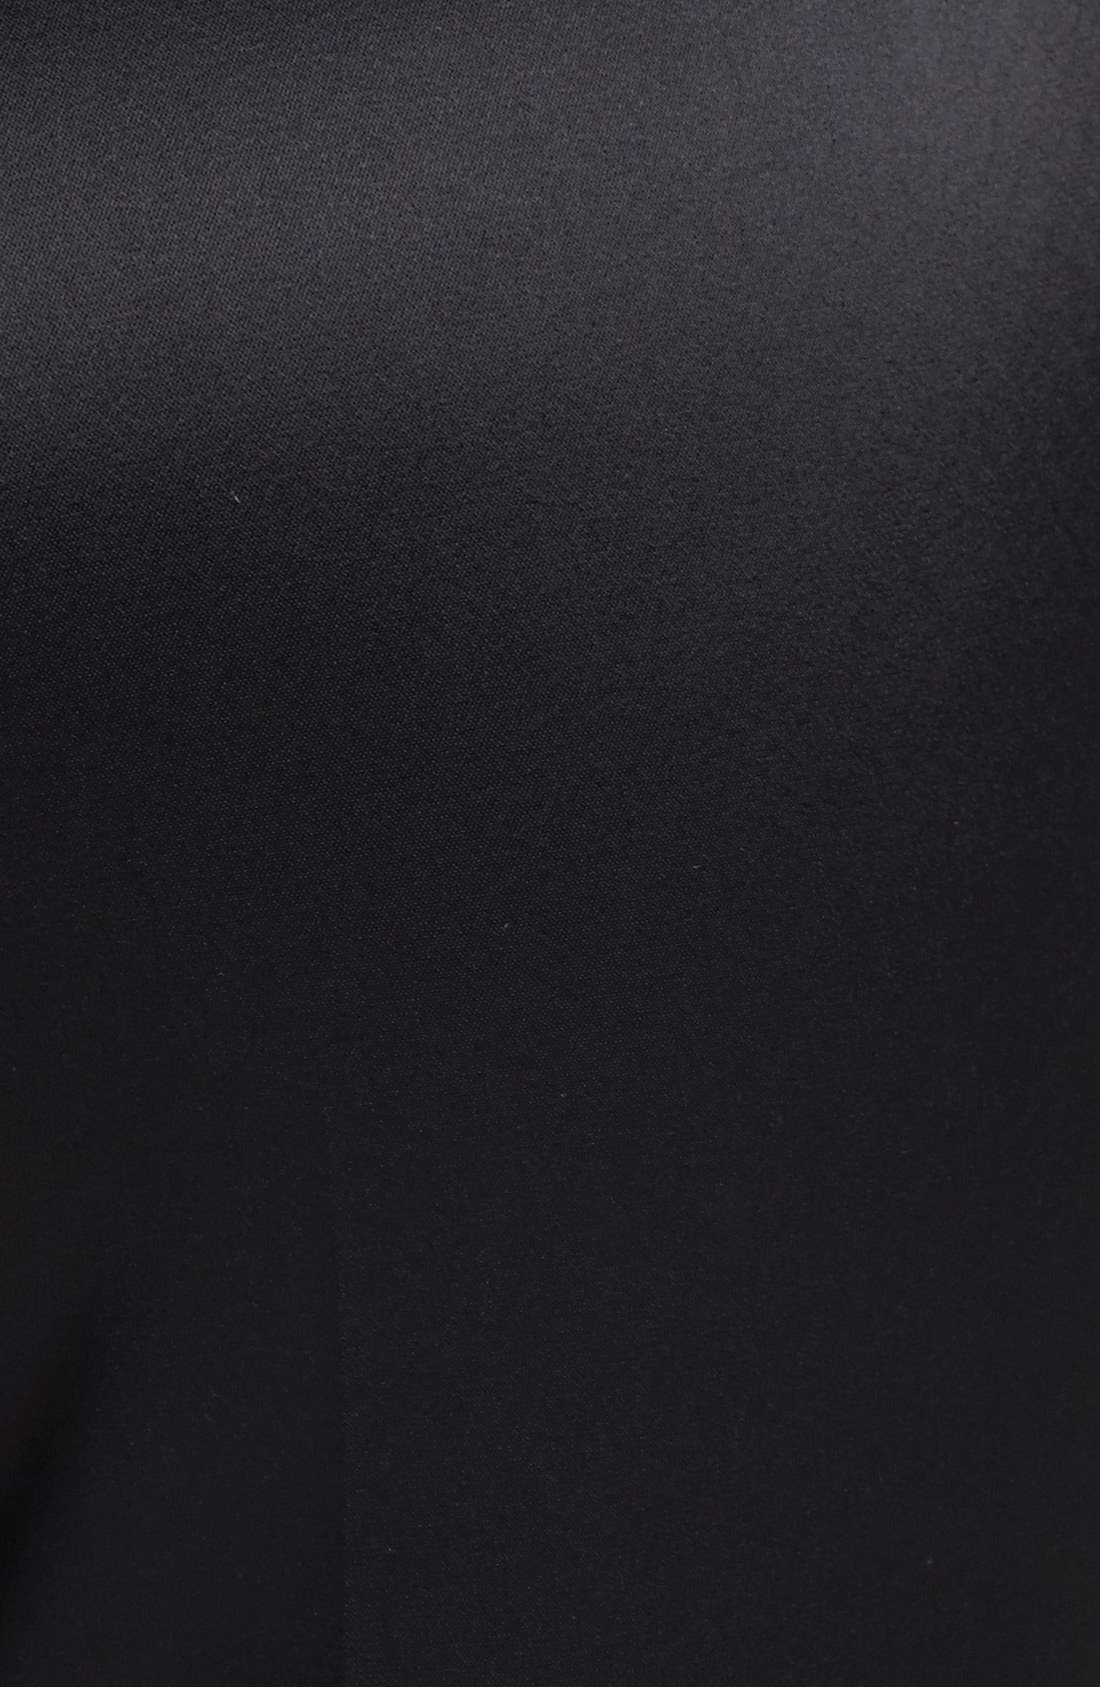 Alternate Image 4  - St. John Collection 'Emma' Liquid Satin Pants